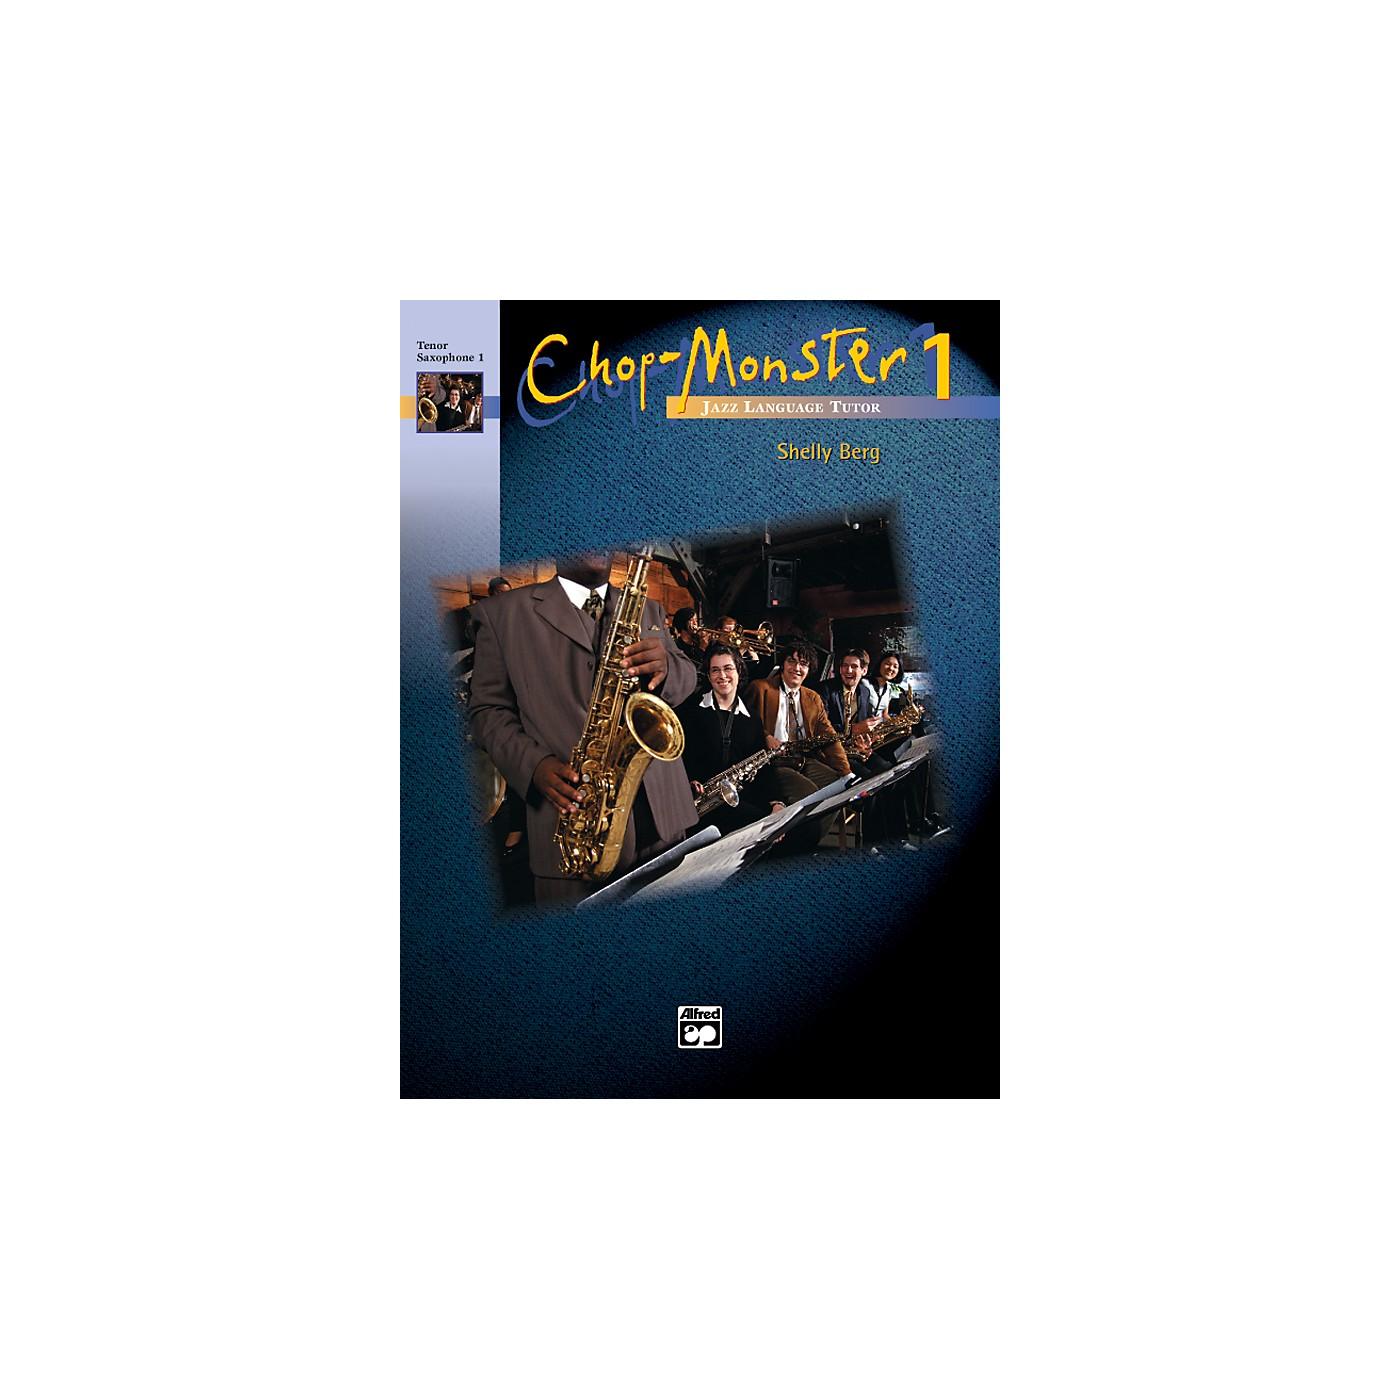 Alfred Chop-Monster Book 1 Trumpet 3 Book thumbnail